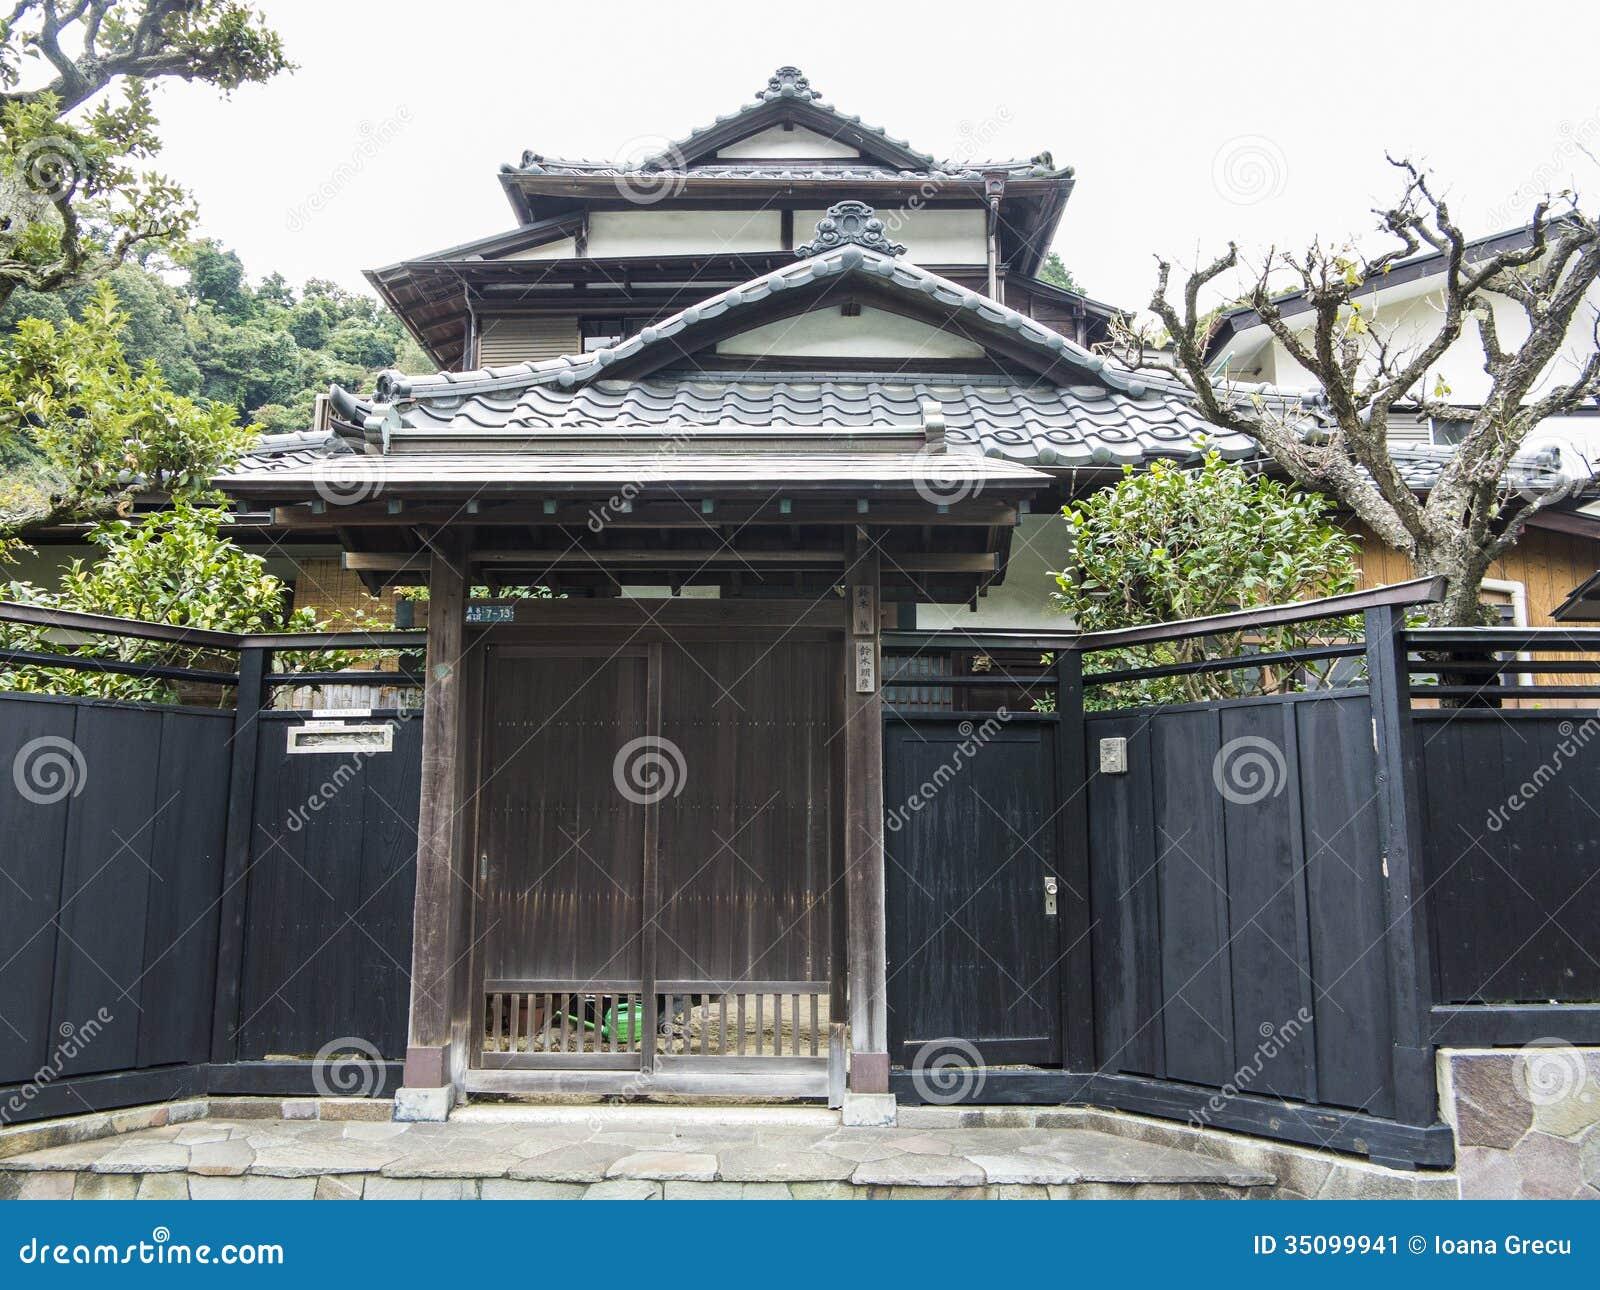 maison japonaise traditionnelle image stock image 35099941. Black Bedroom Furniture Sets. Home Design Ideas